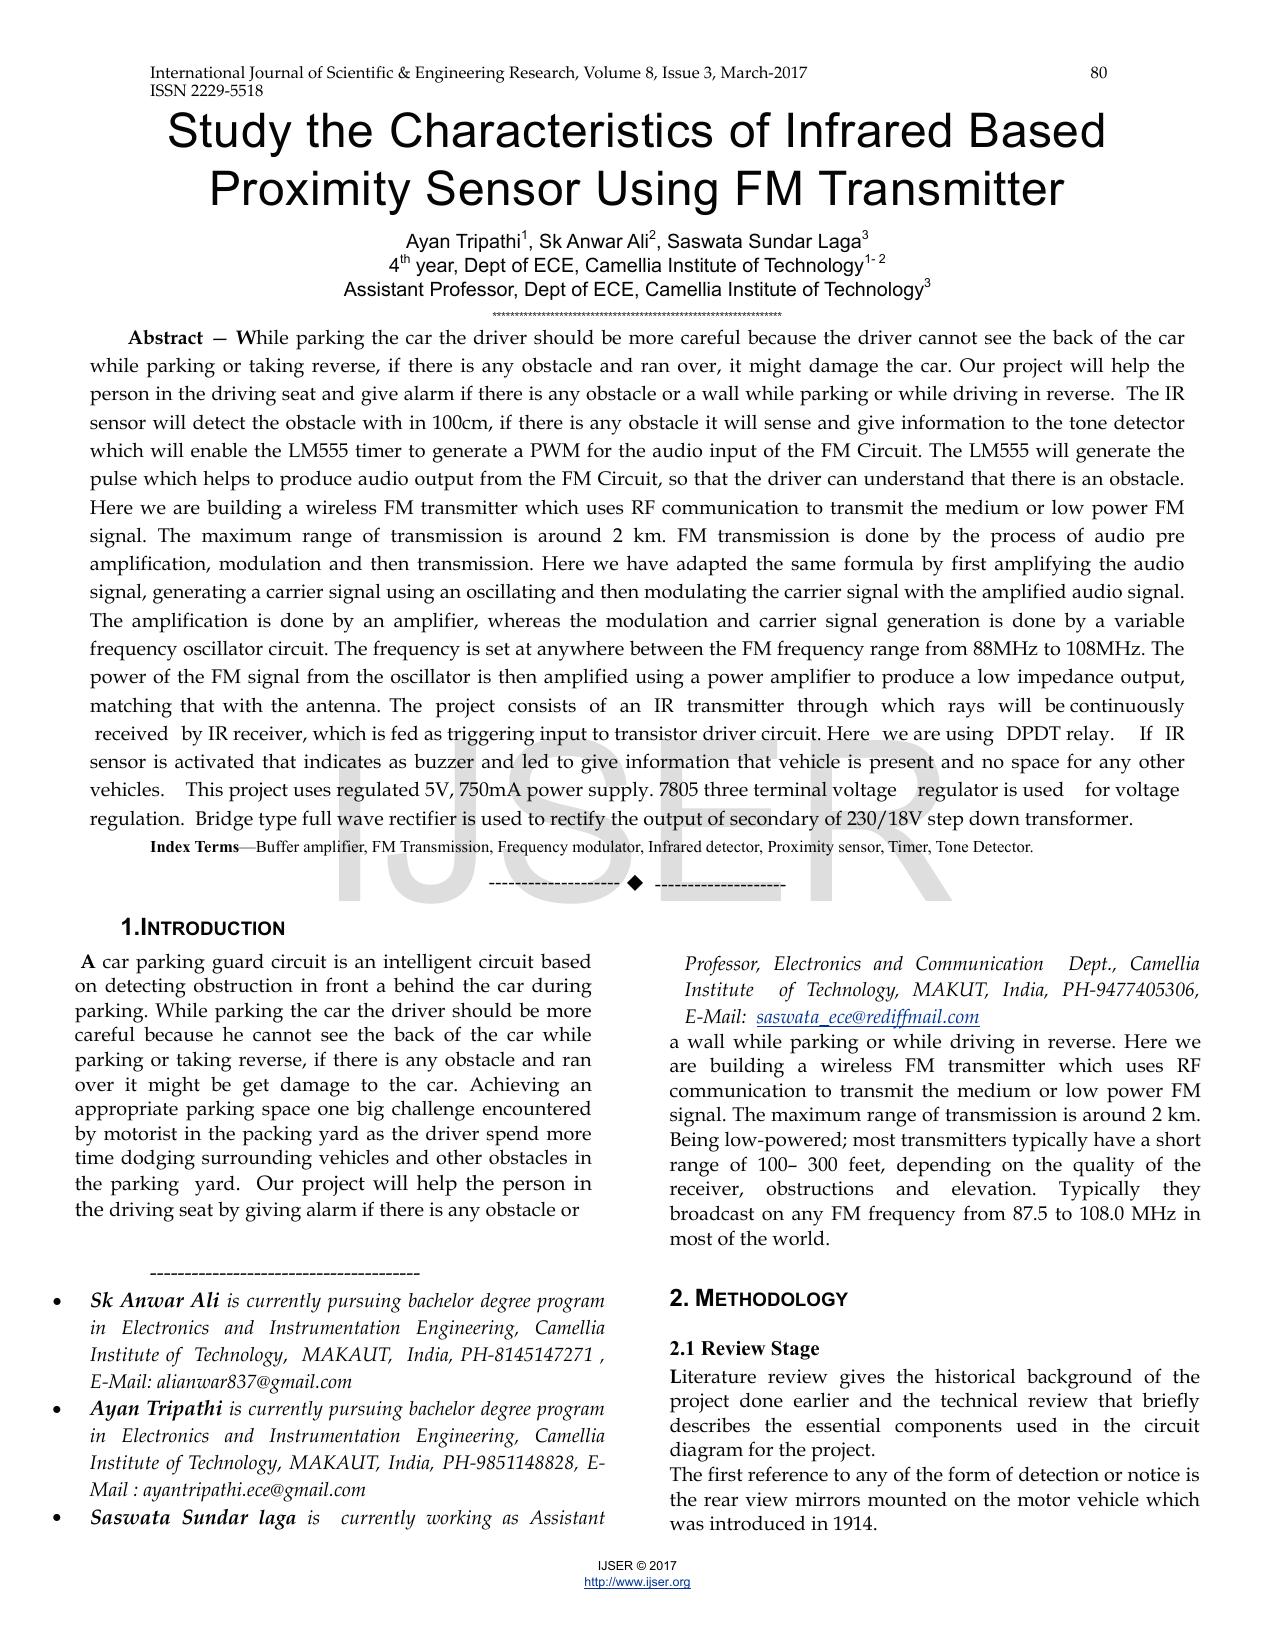 Study The Characteristics Of Infrared Based Proximity Sensor Circuits